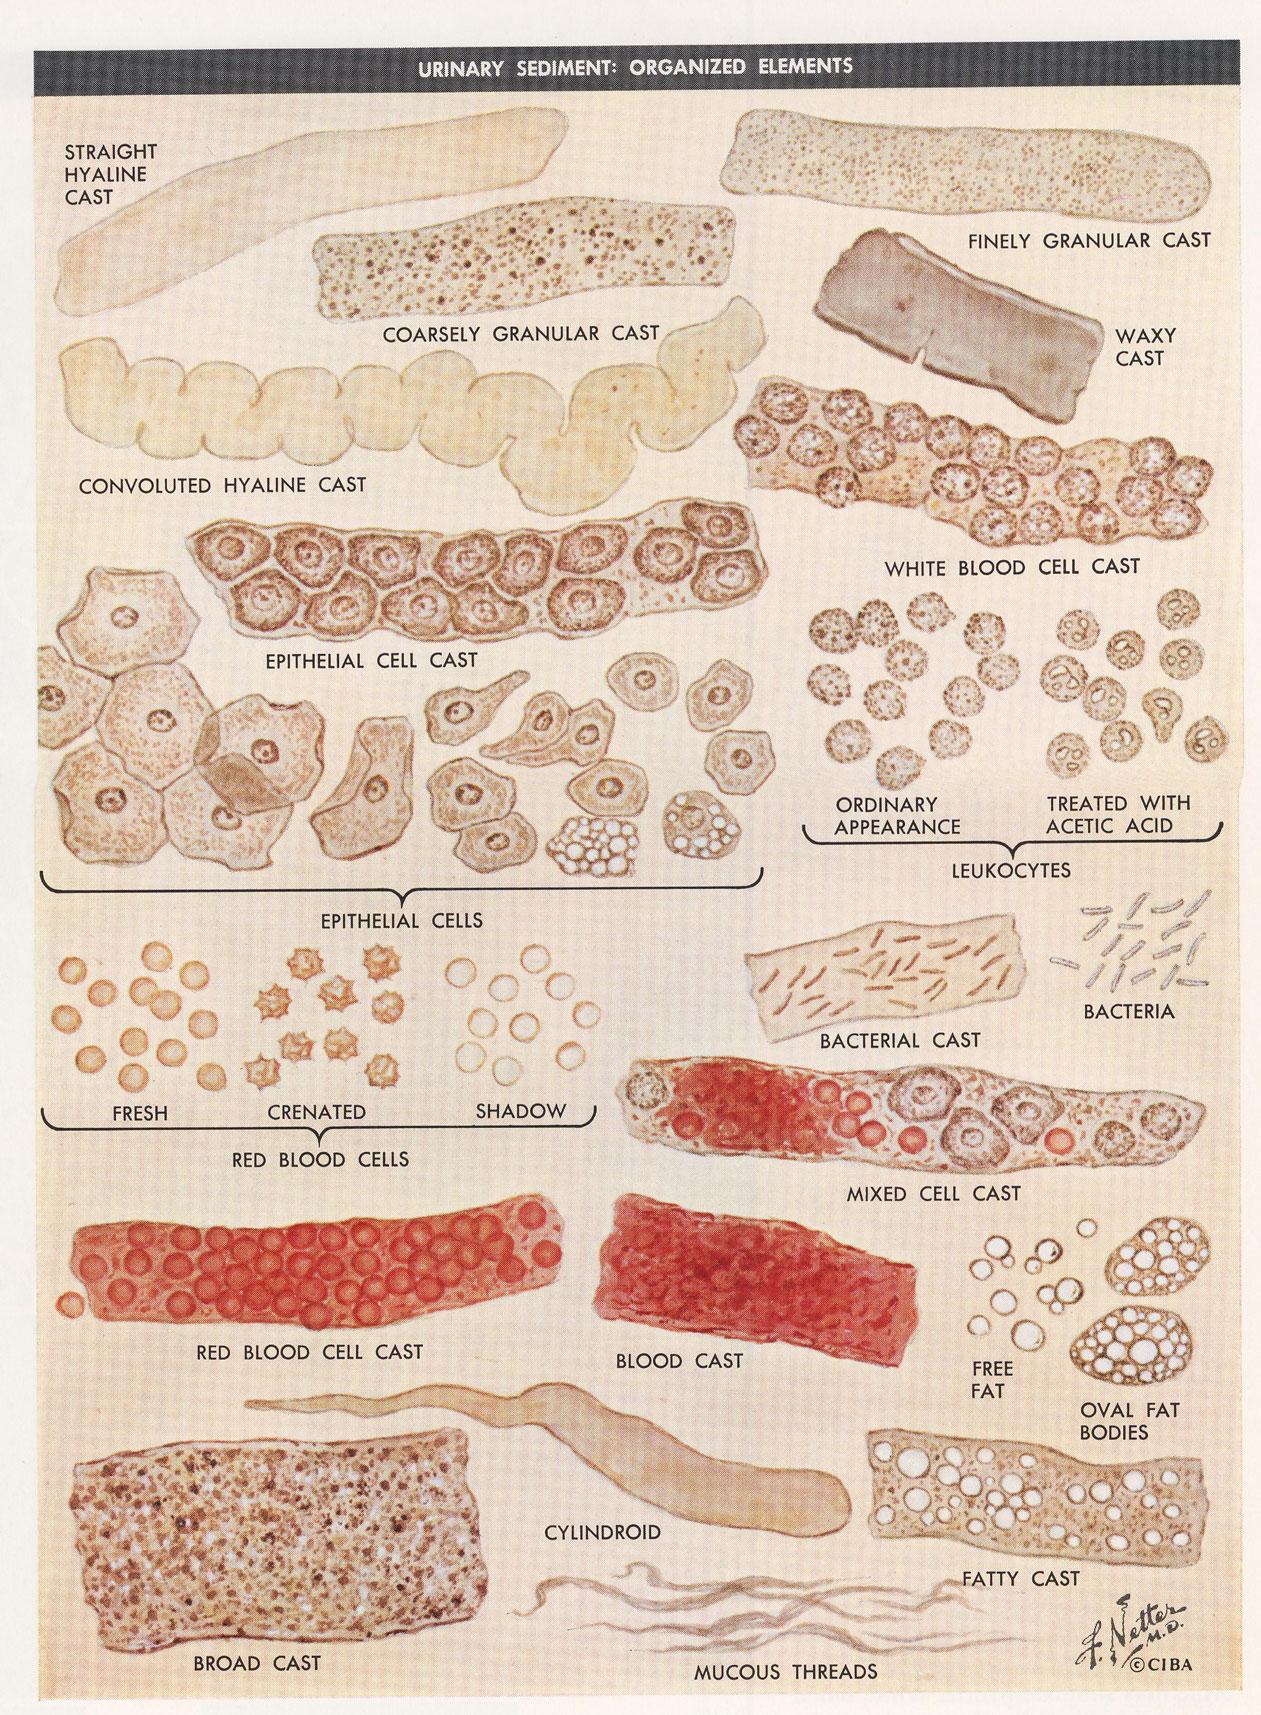 Urine Sediment | Renal